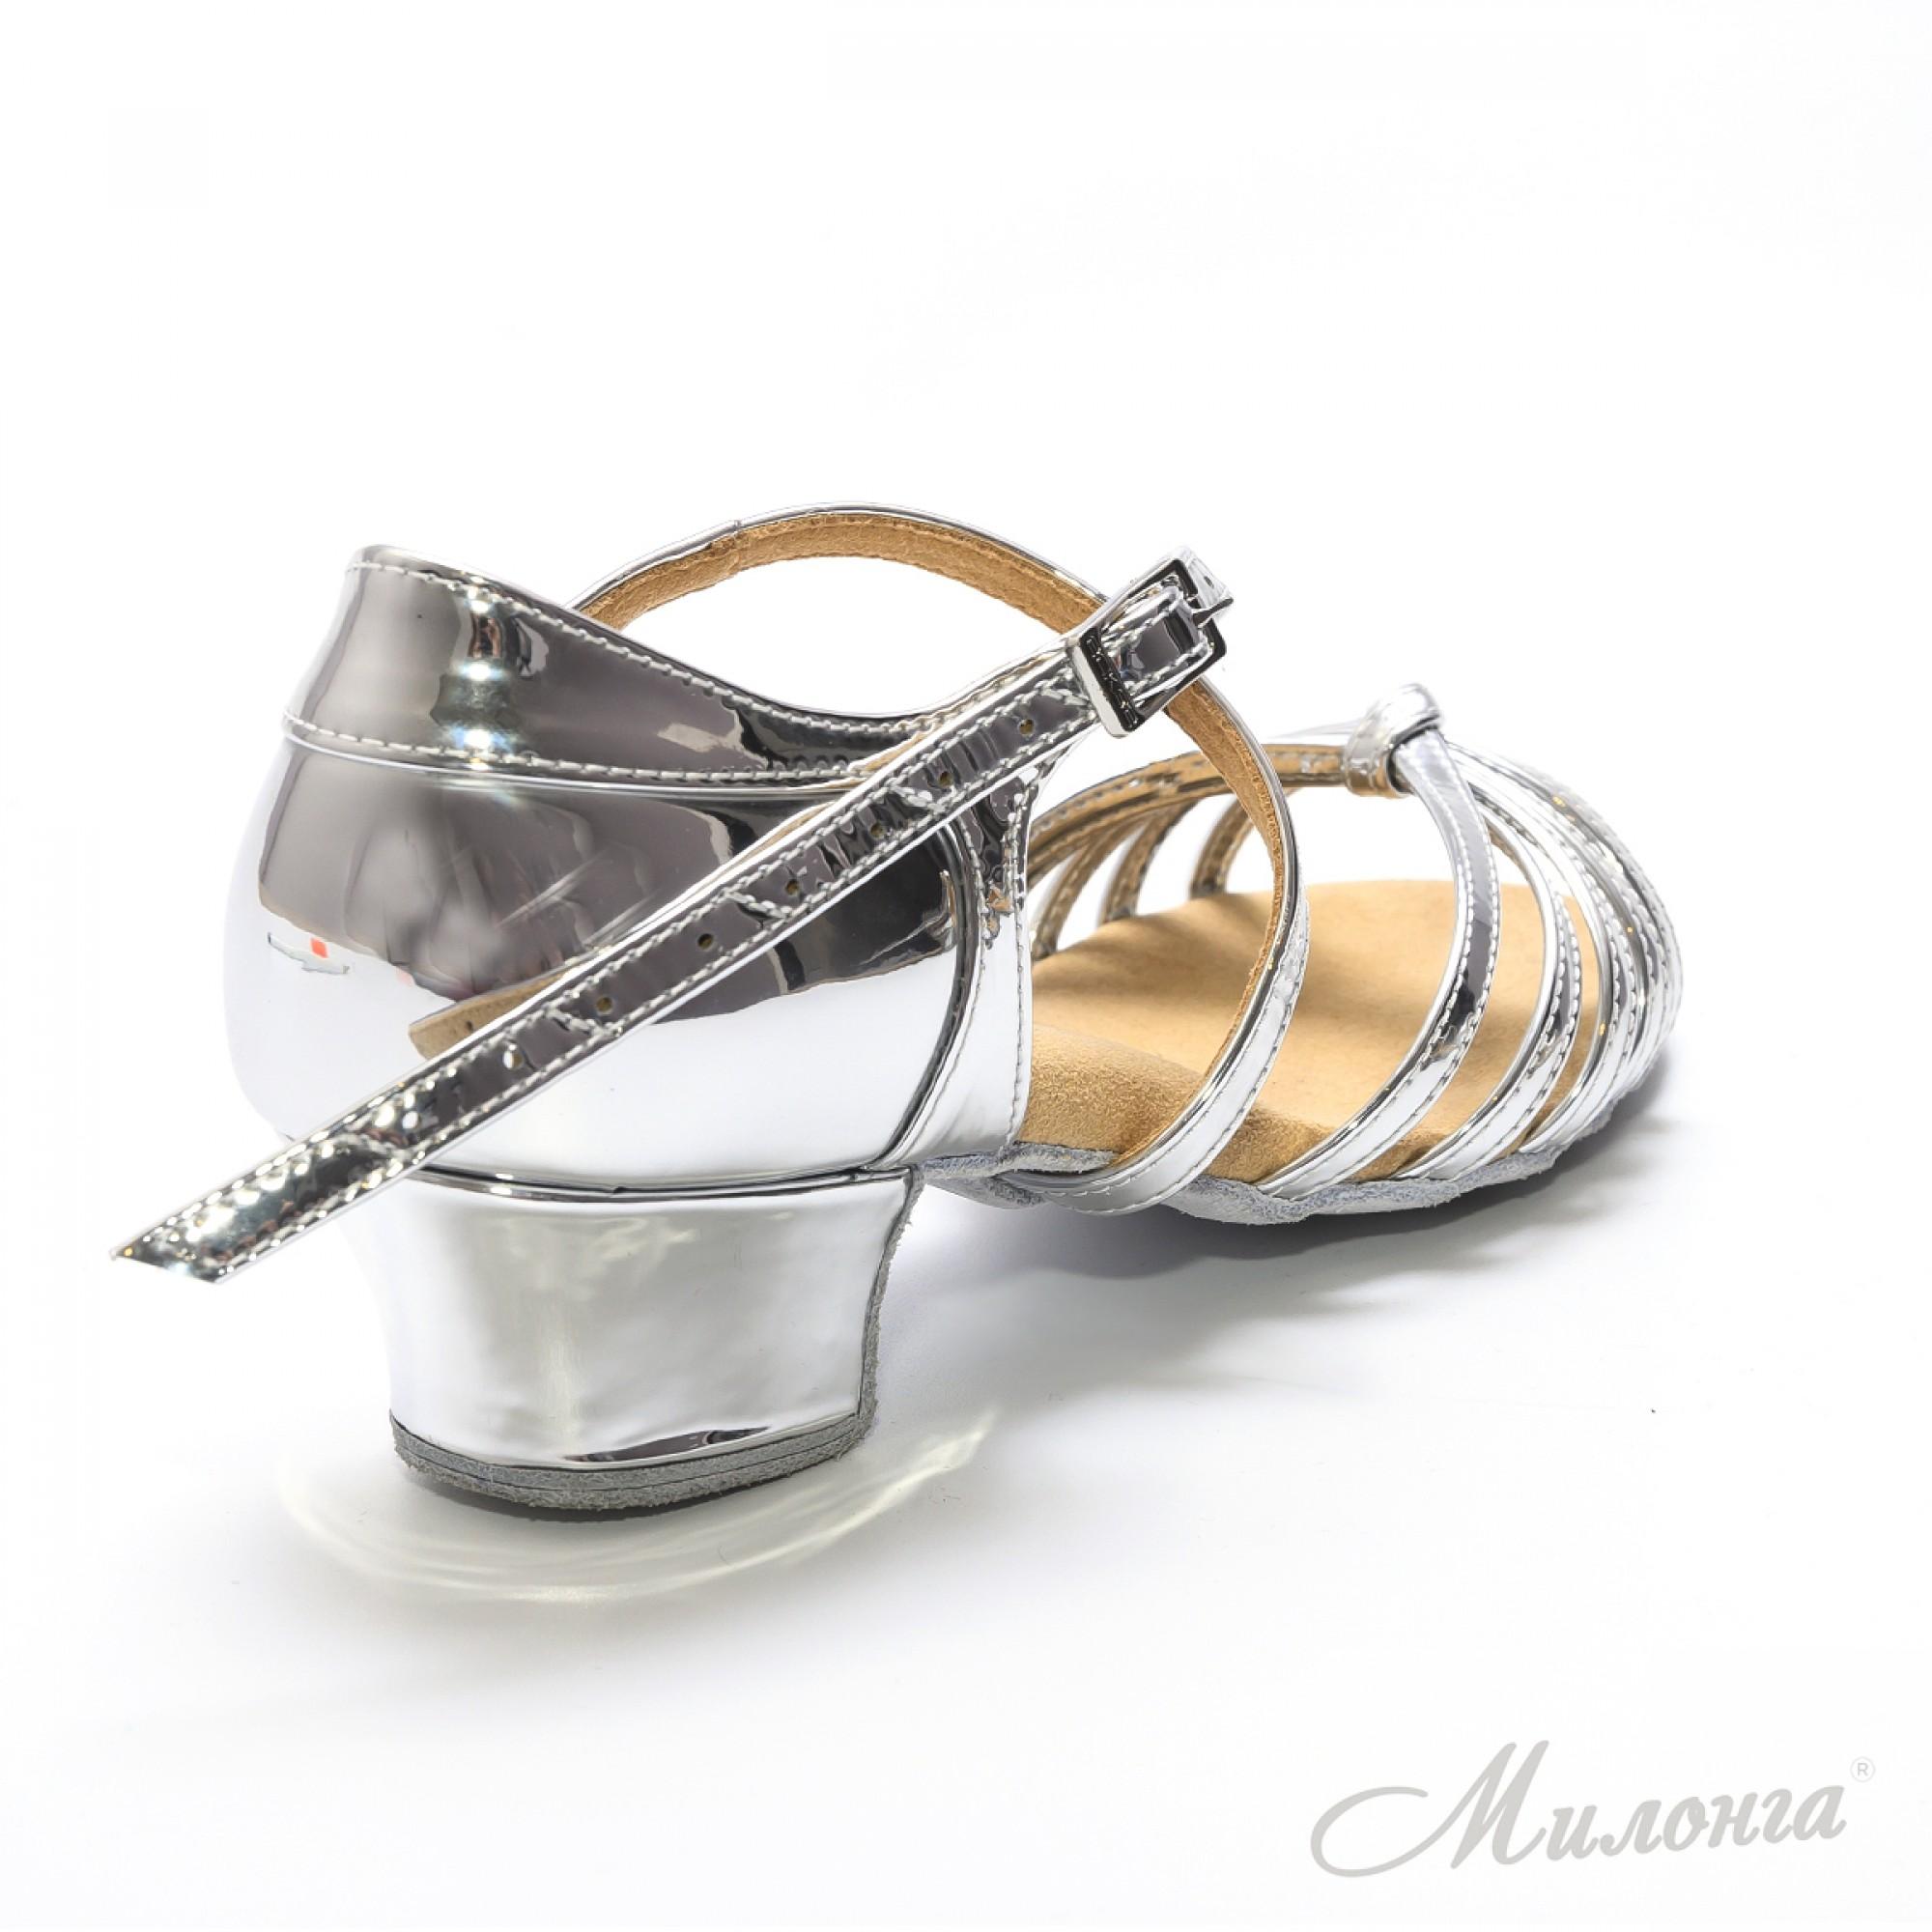 Алонца В, зеркальное серебро